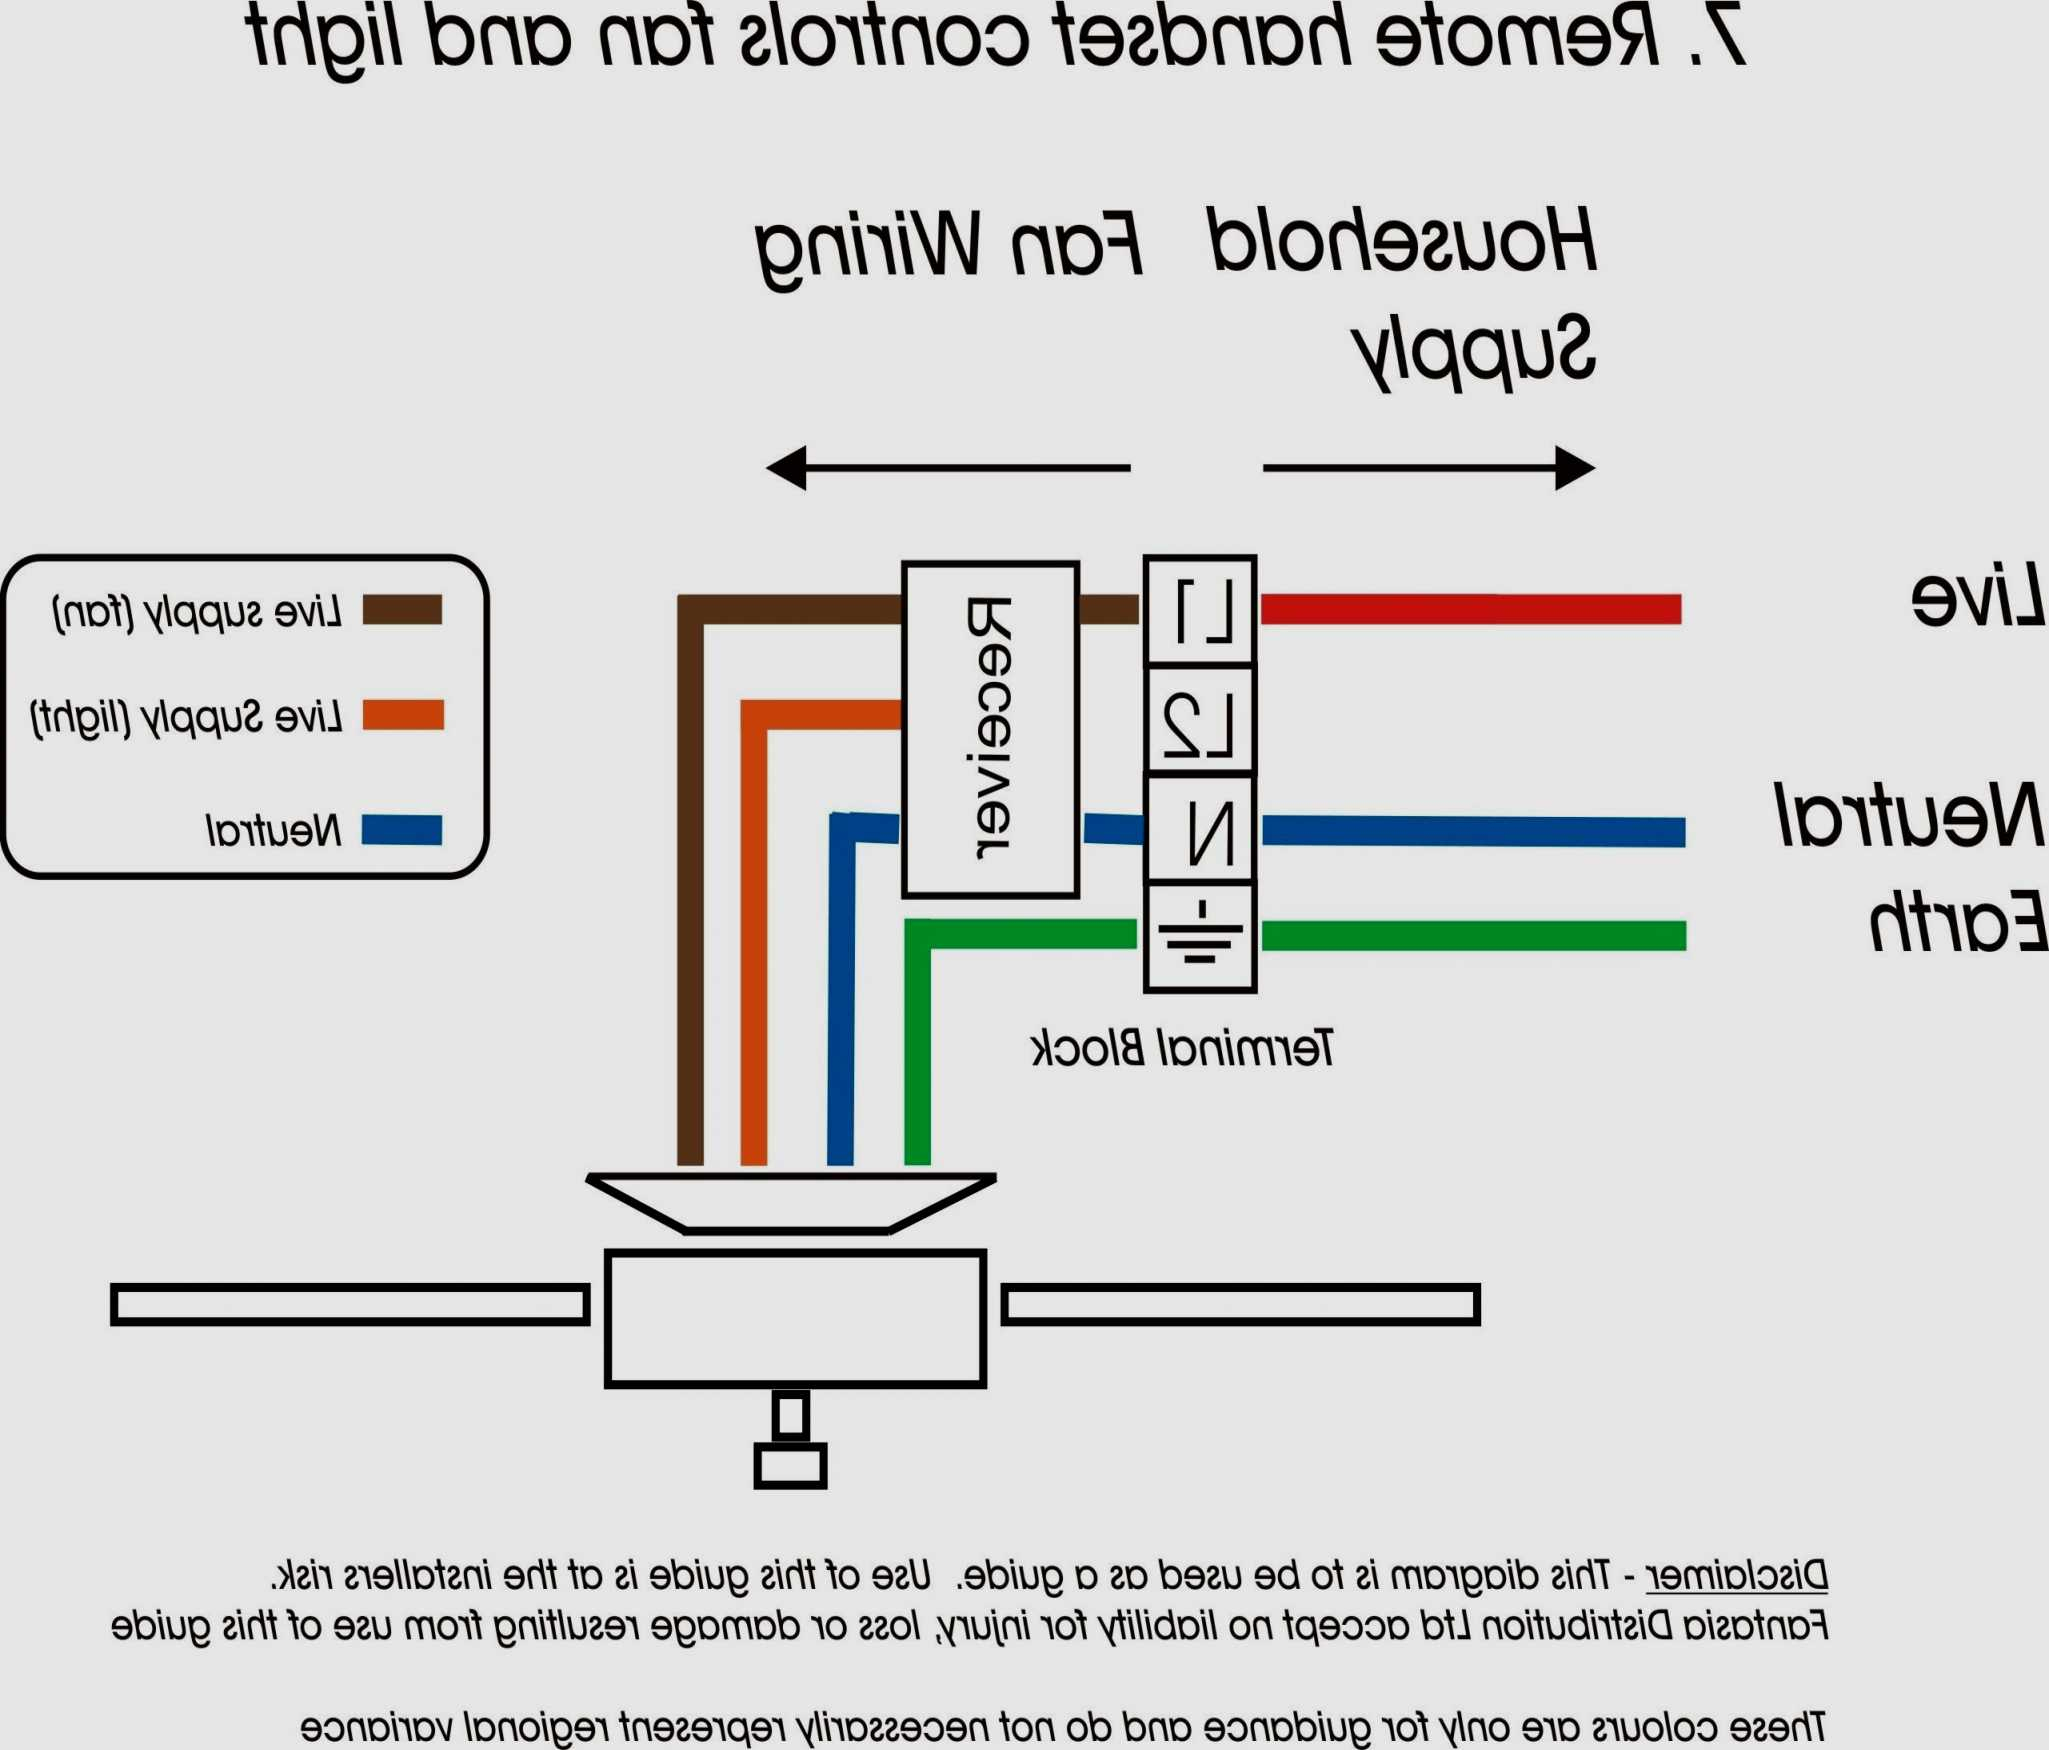 Dryer Plug Wiring Diagram New Electric Dryer Wiring Diagram For 220 - Dryer Plug Wiring Diagram